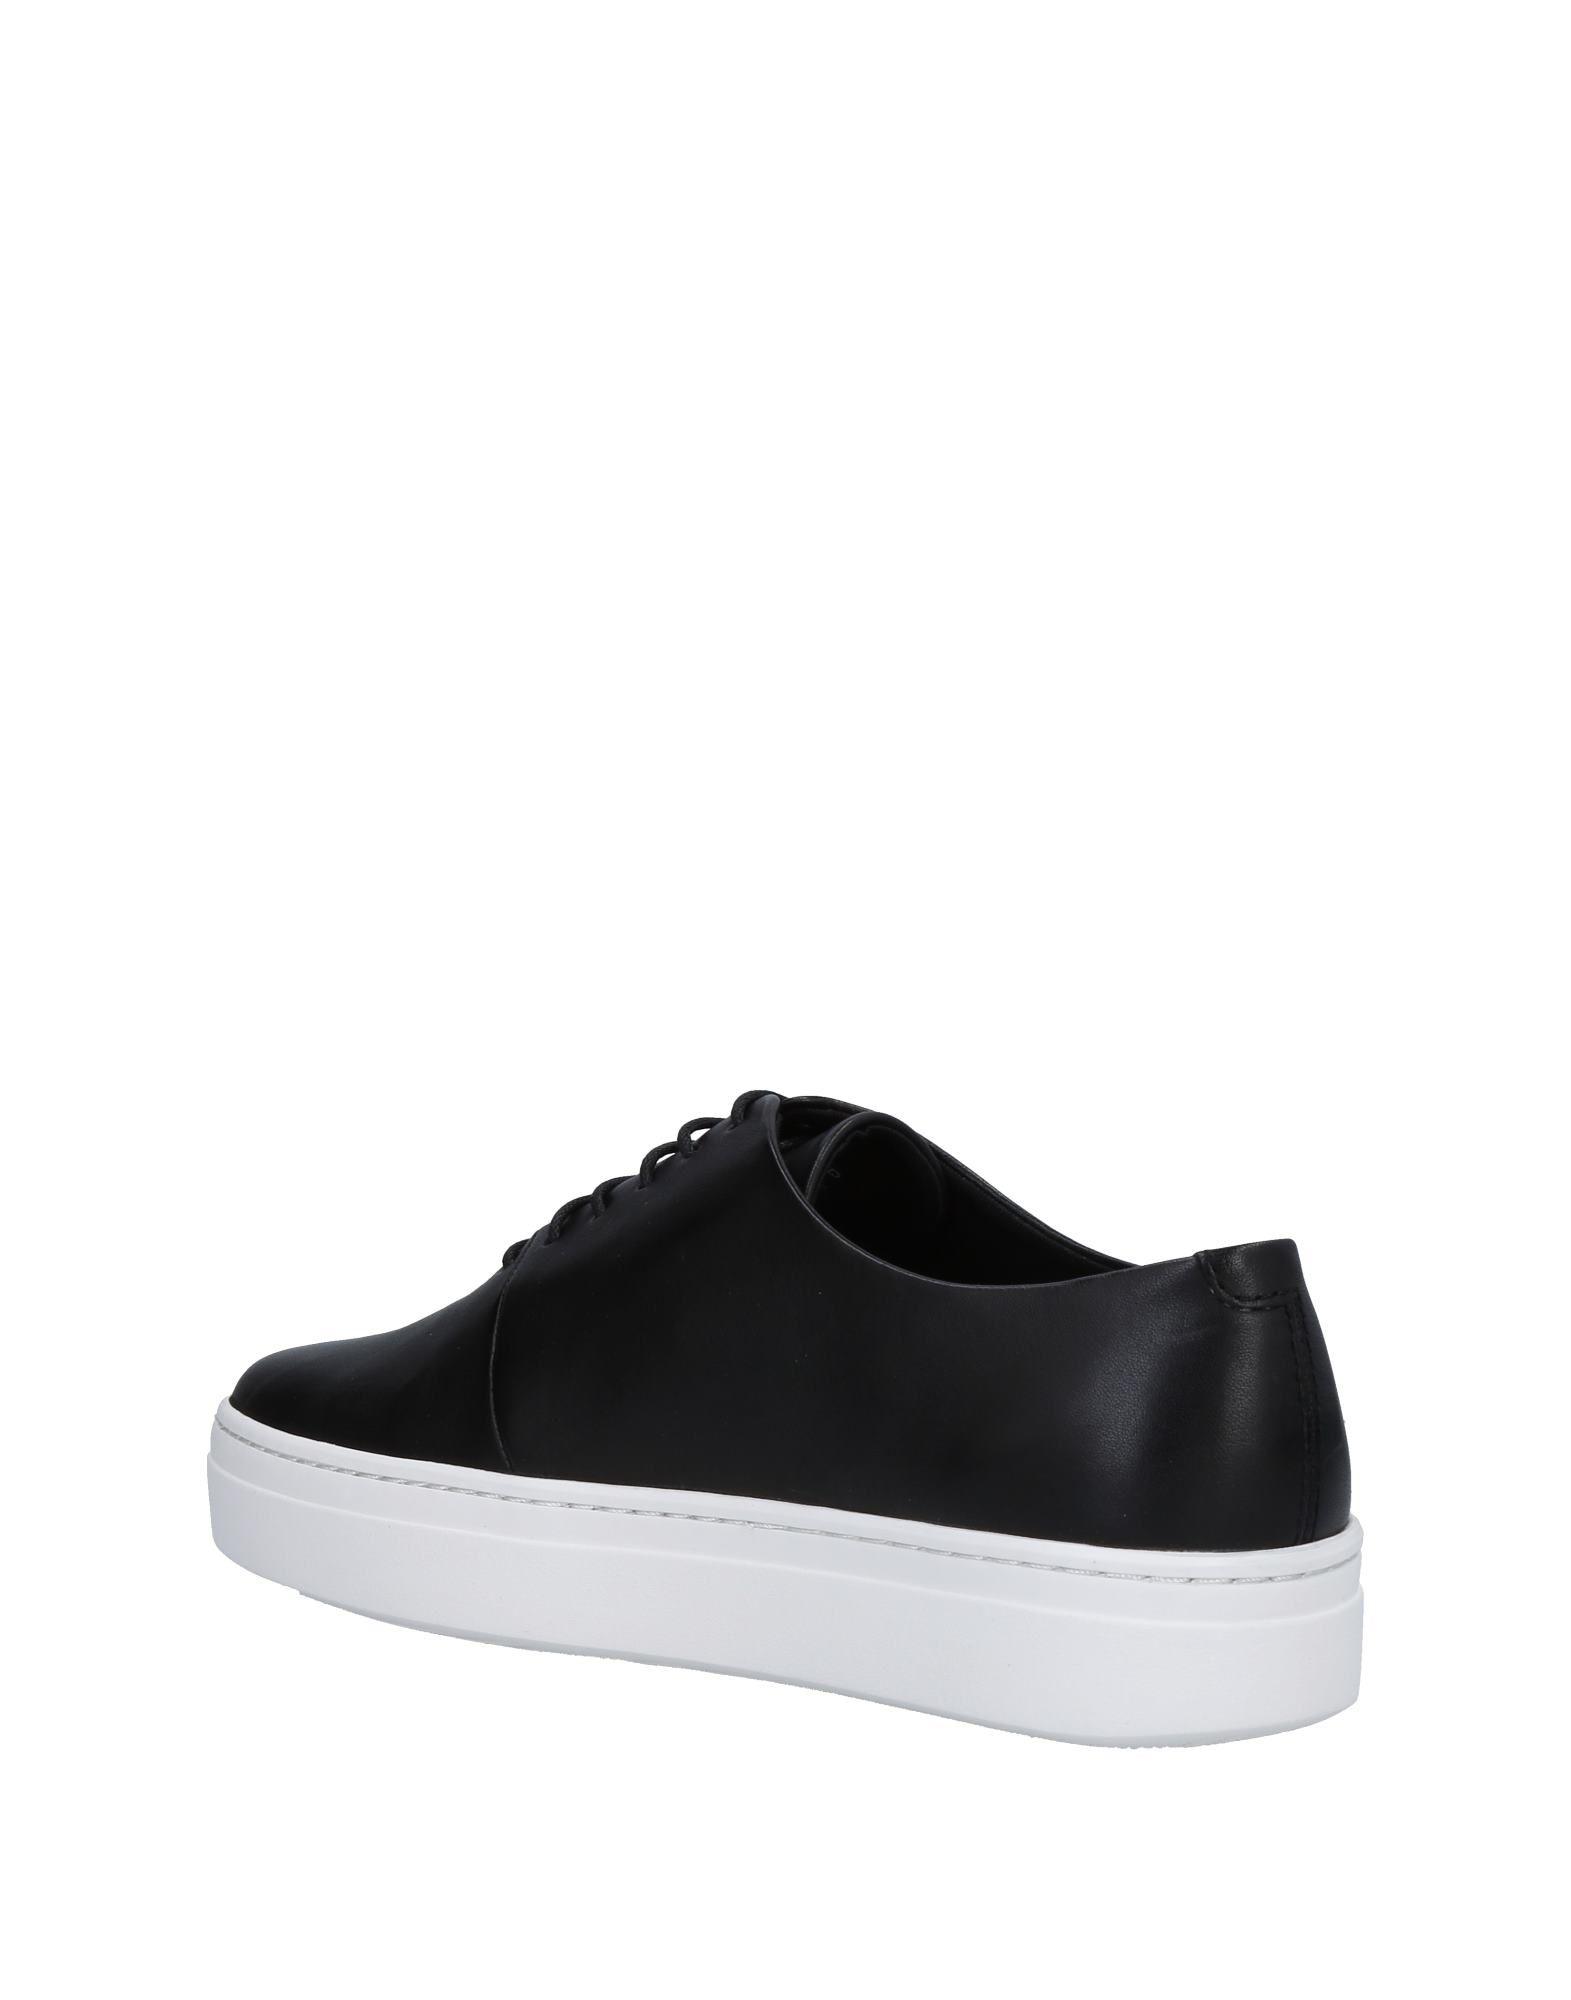 Vagabond Gute Shoemakers Sneakers Damen  11477603HV Gute Vagabond Qualität beliebte Schuhe 88e26e